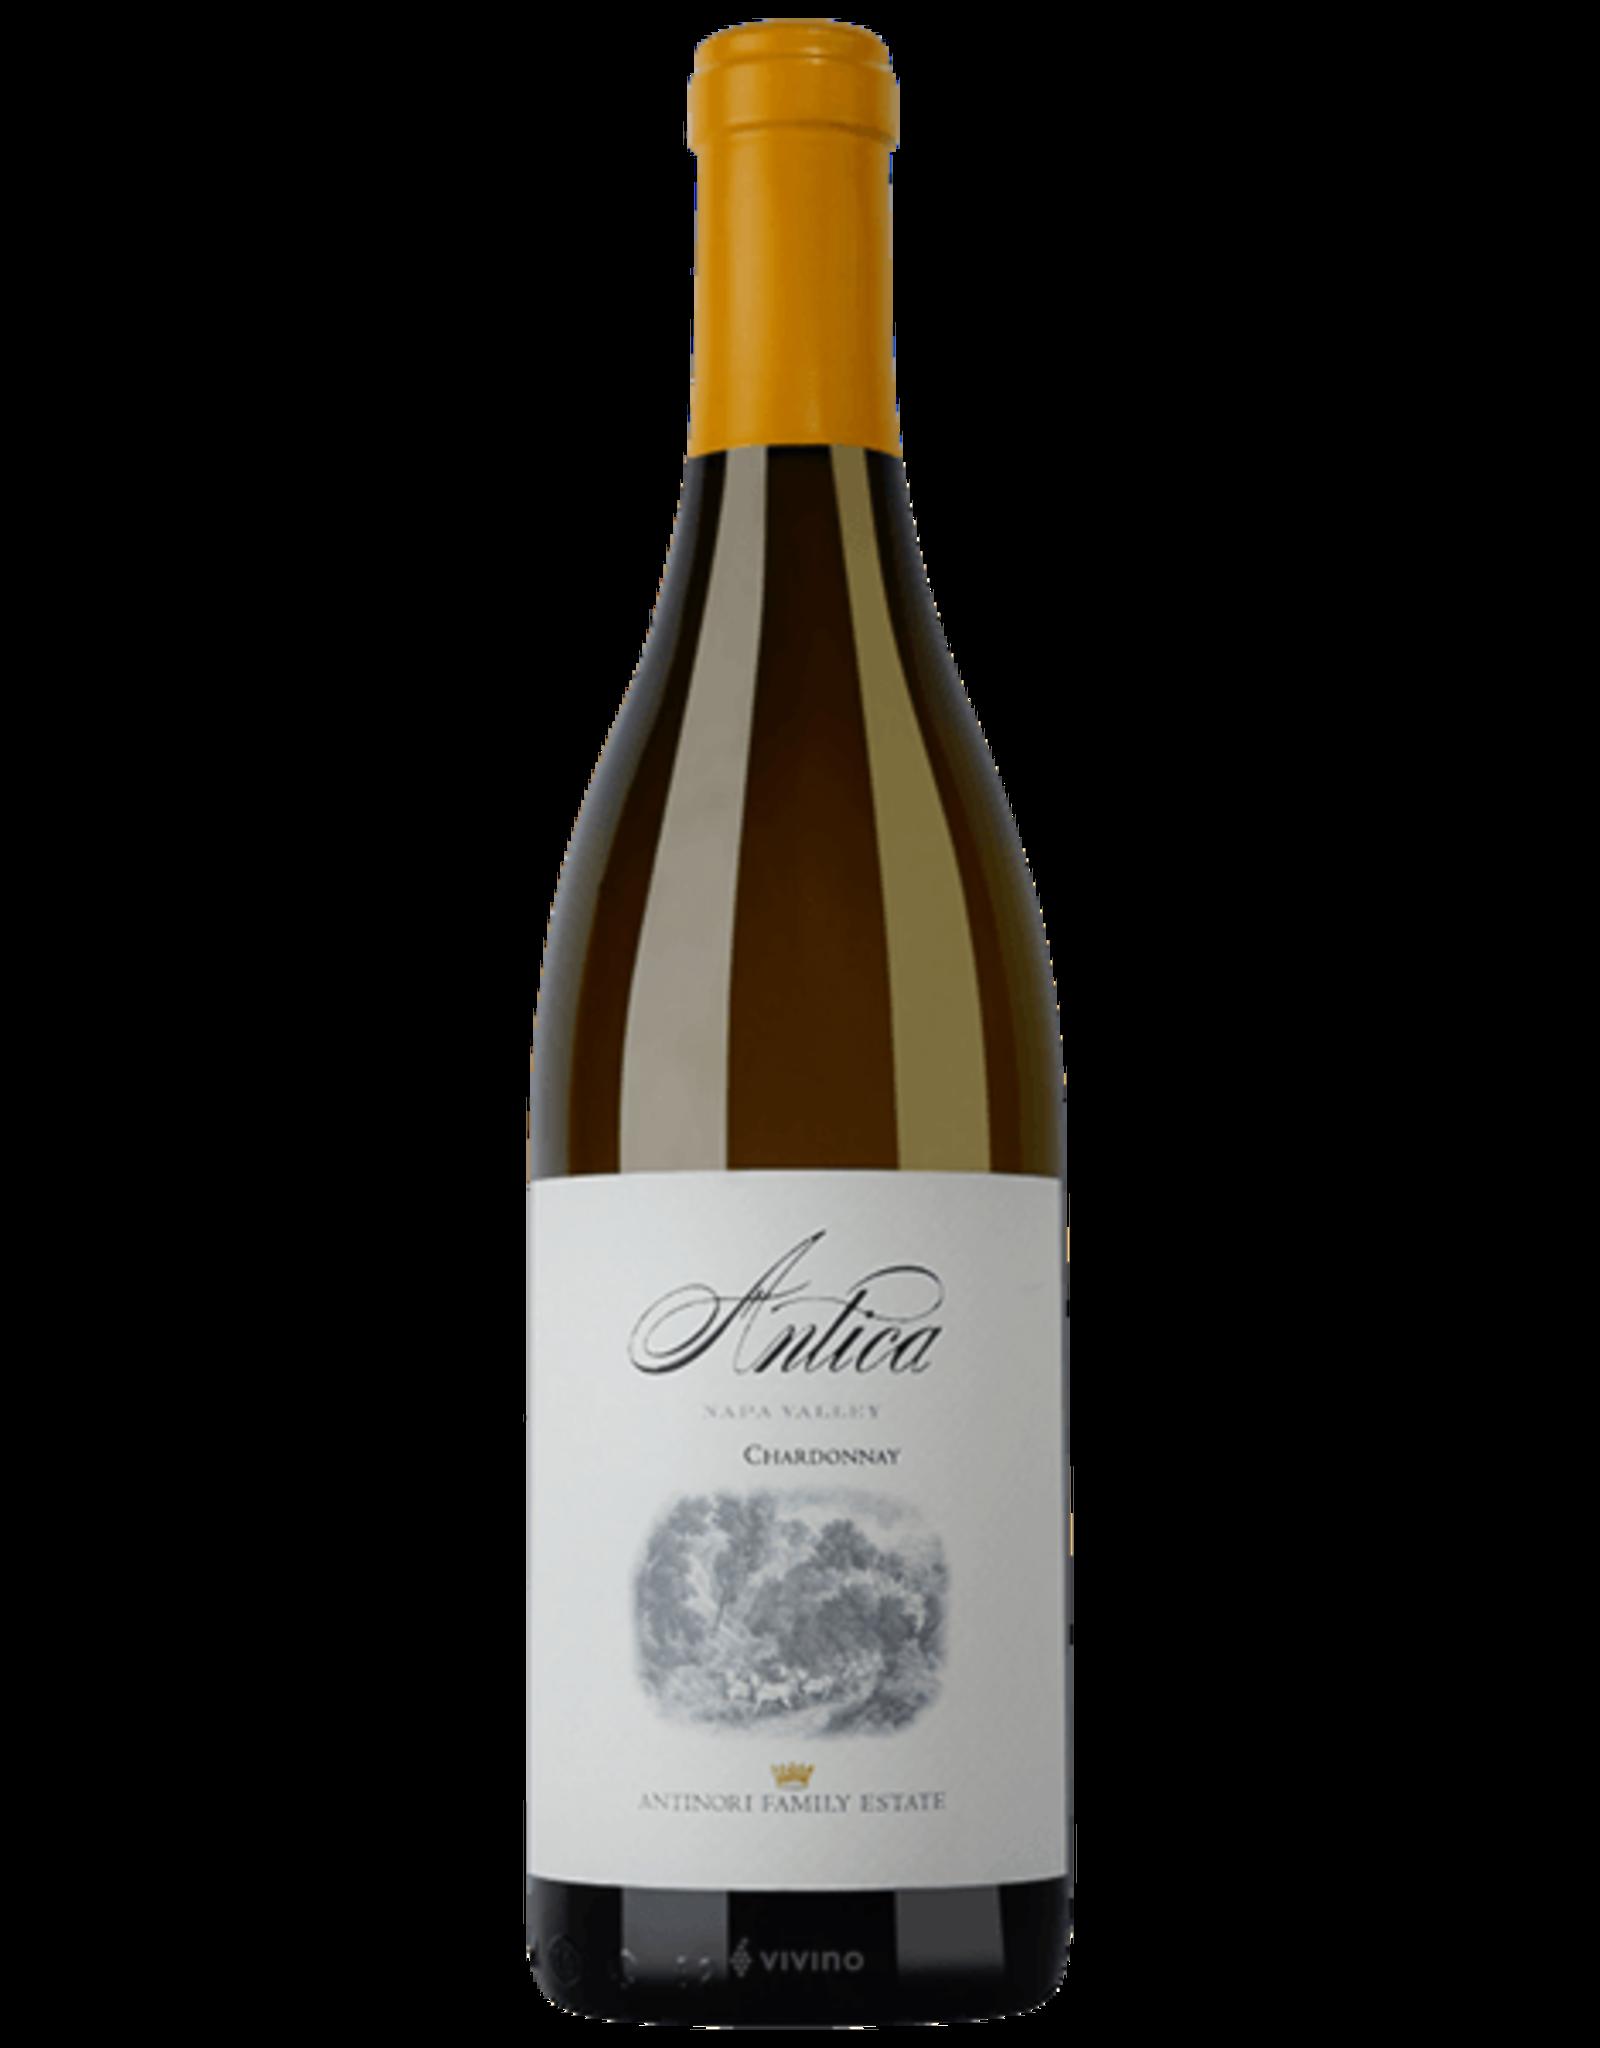 Antica Chardonnay 2014